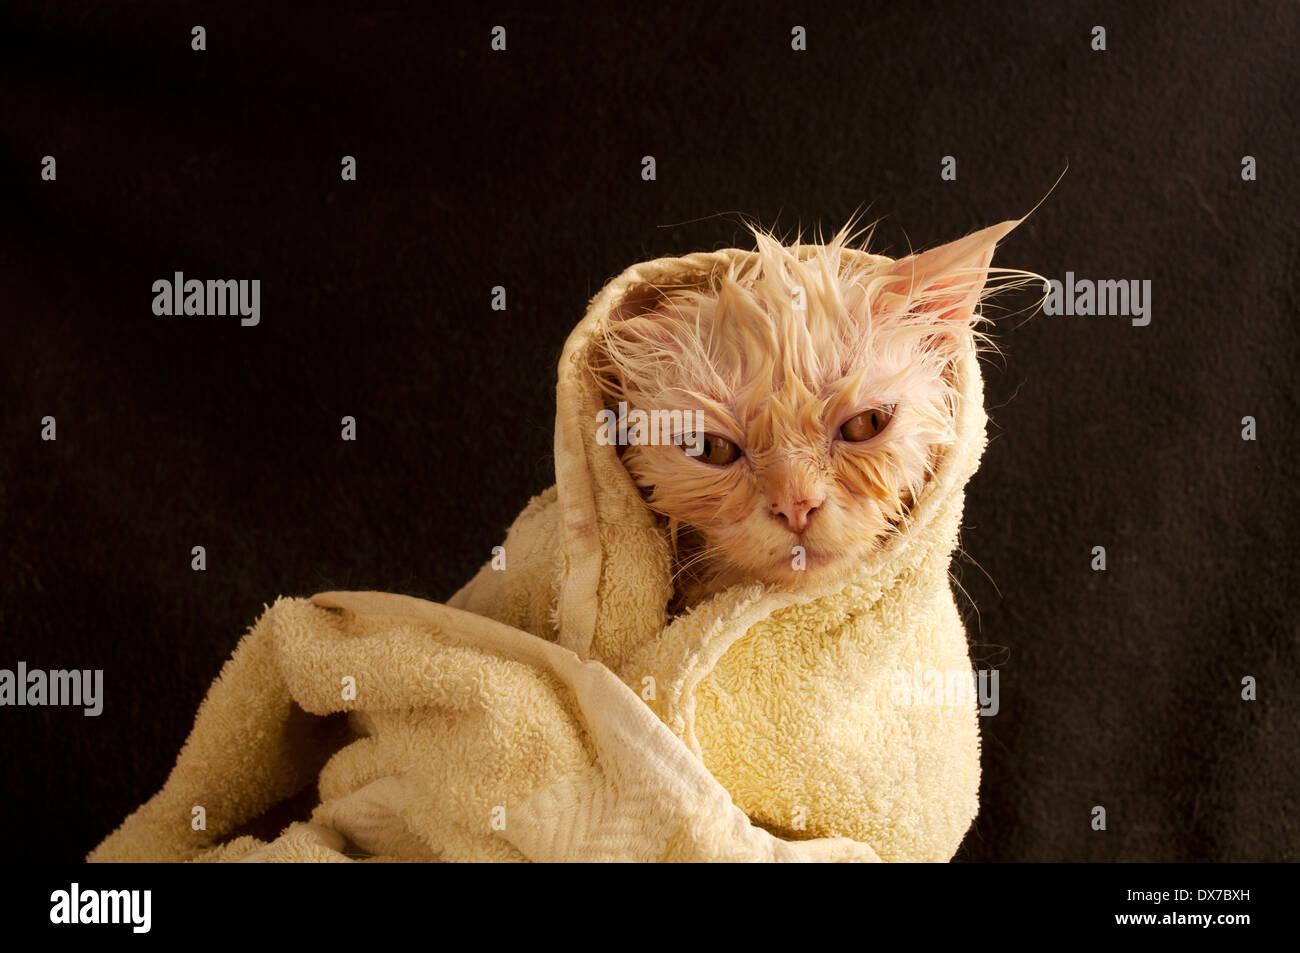 Wet kitty - Stock Image